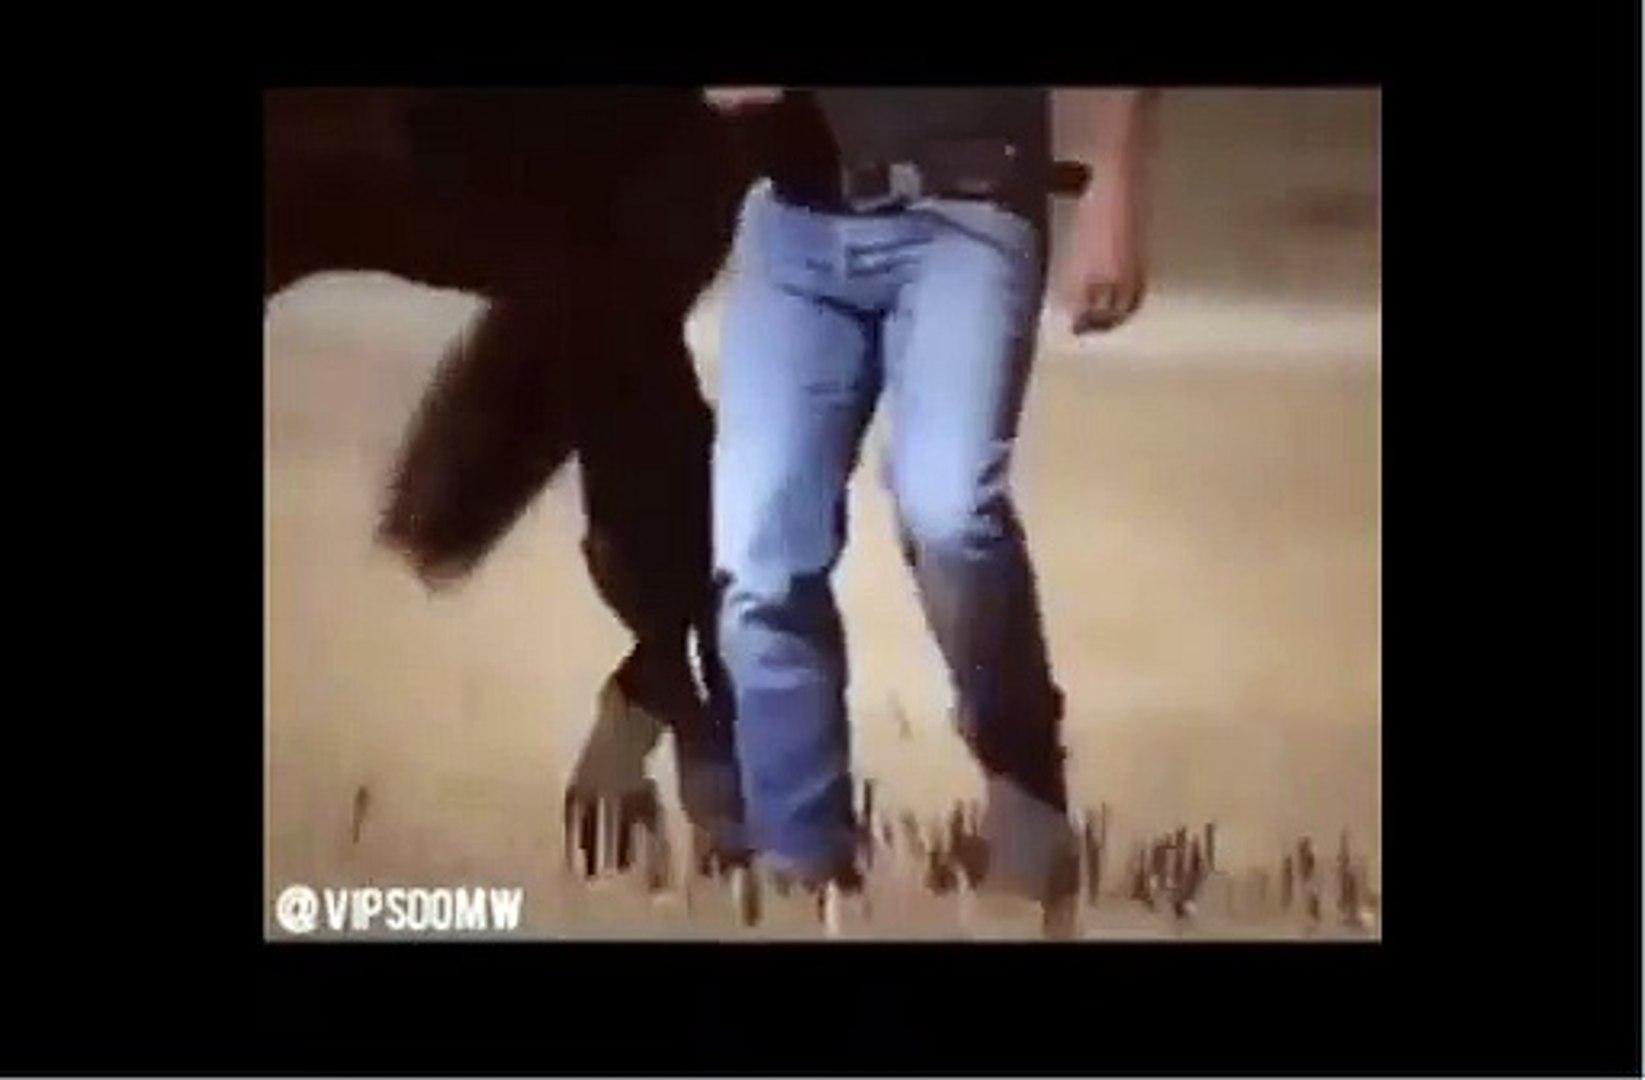 beautiful horse dance beautiful animals video animal viral video